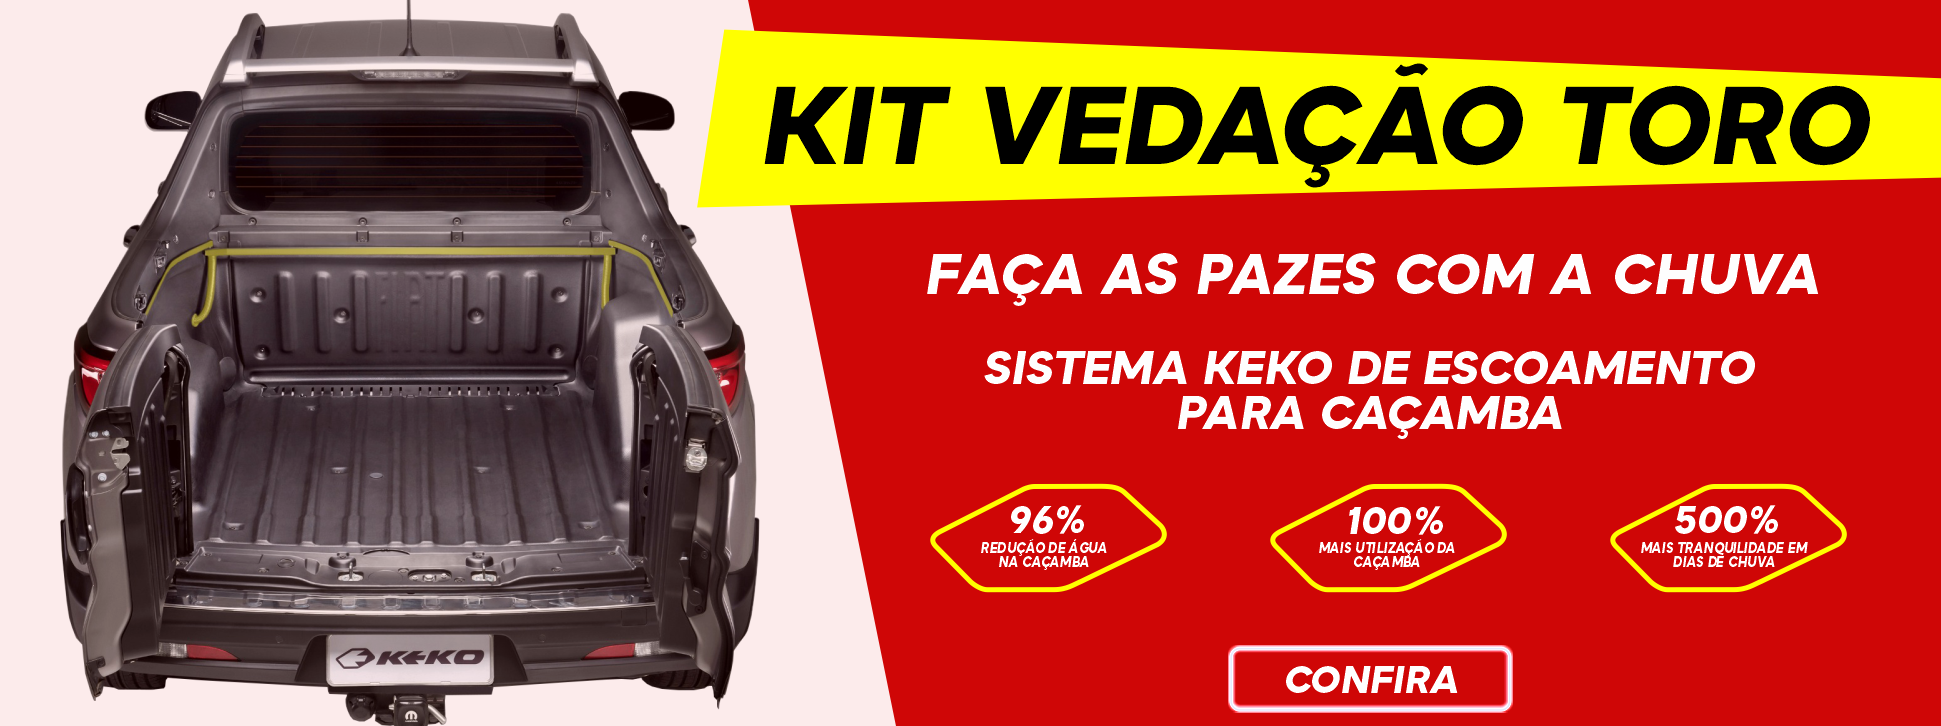 Kit vedação Toro